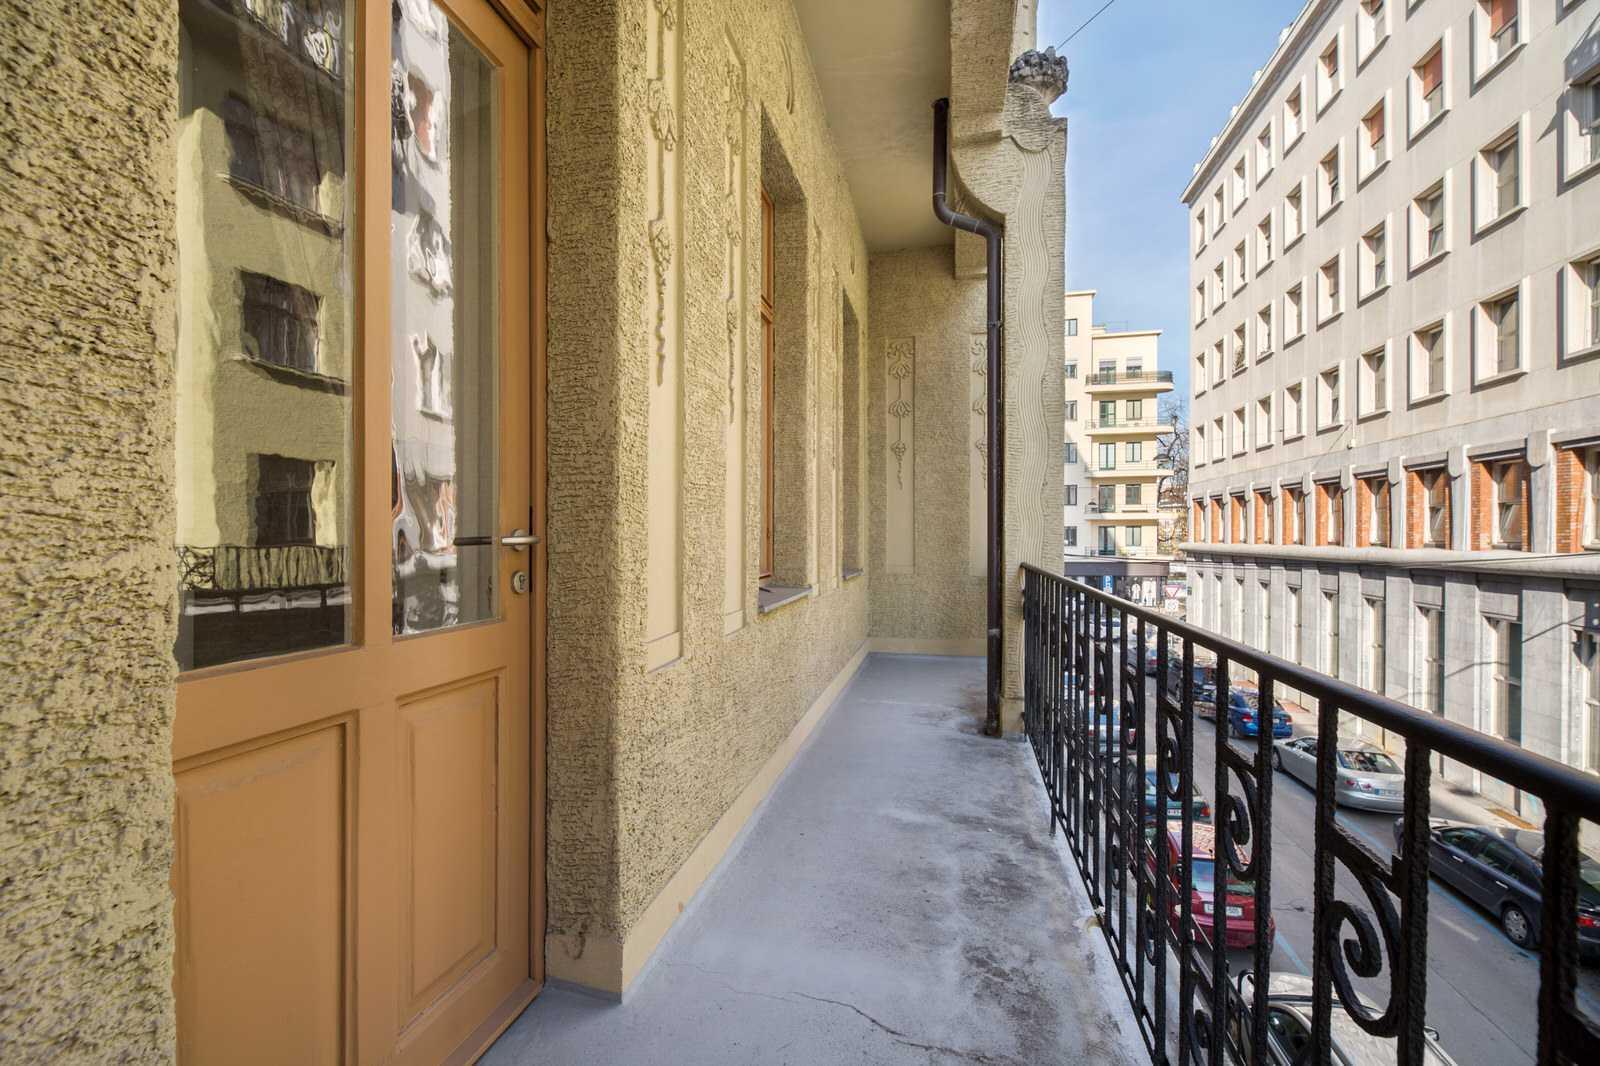 Ljubljana 2-bedroom Beethovnova apartment's second balcony with a street view